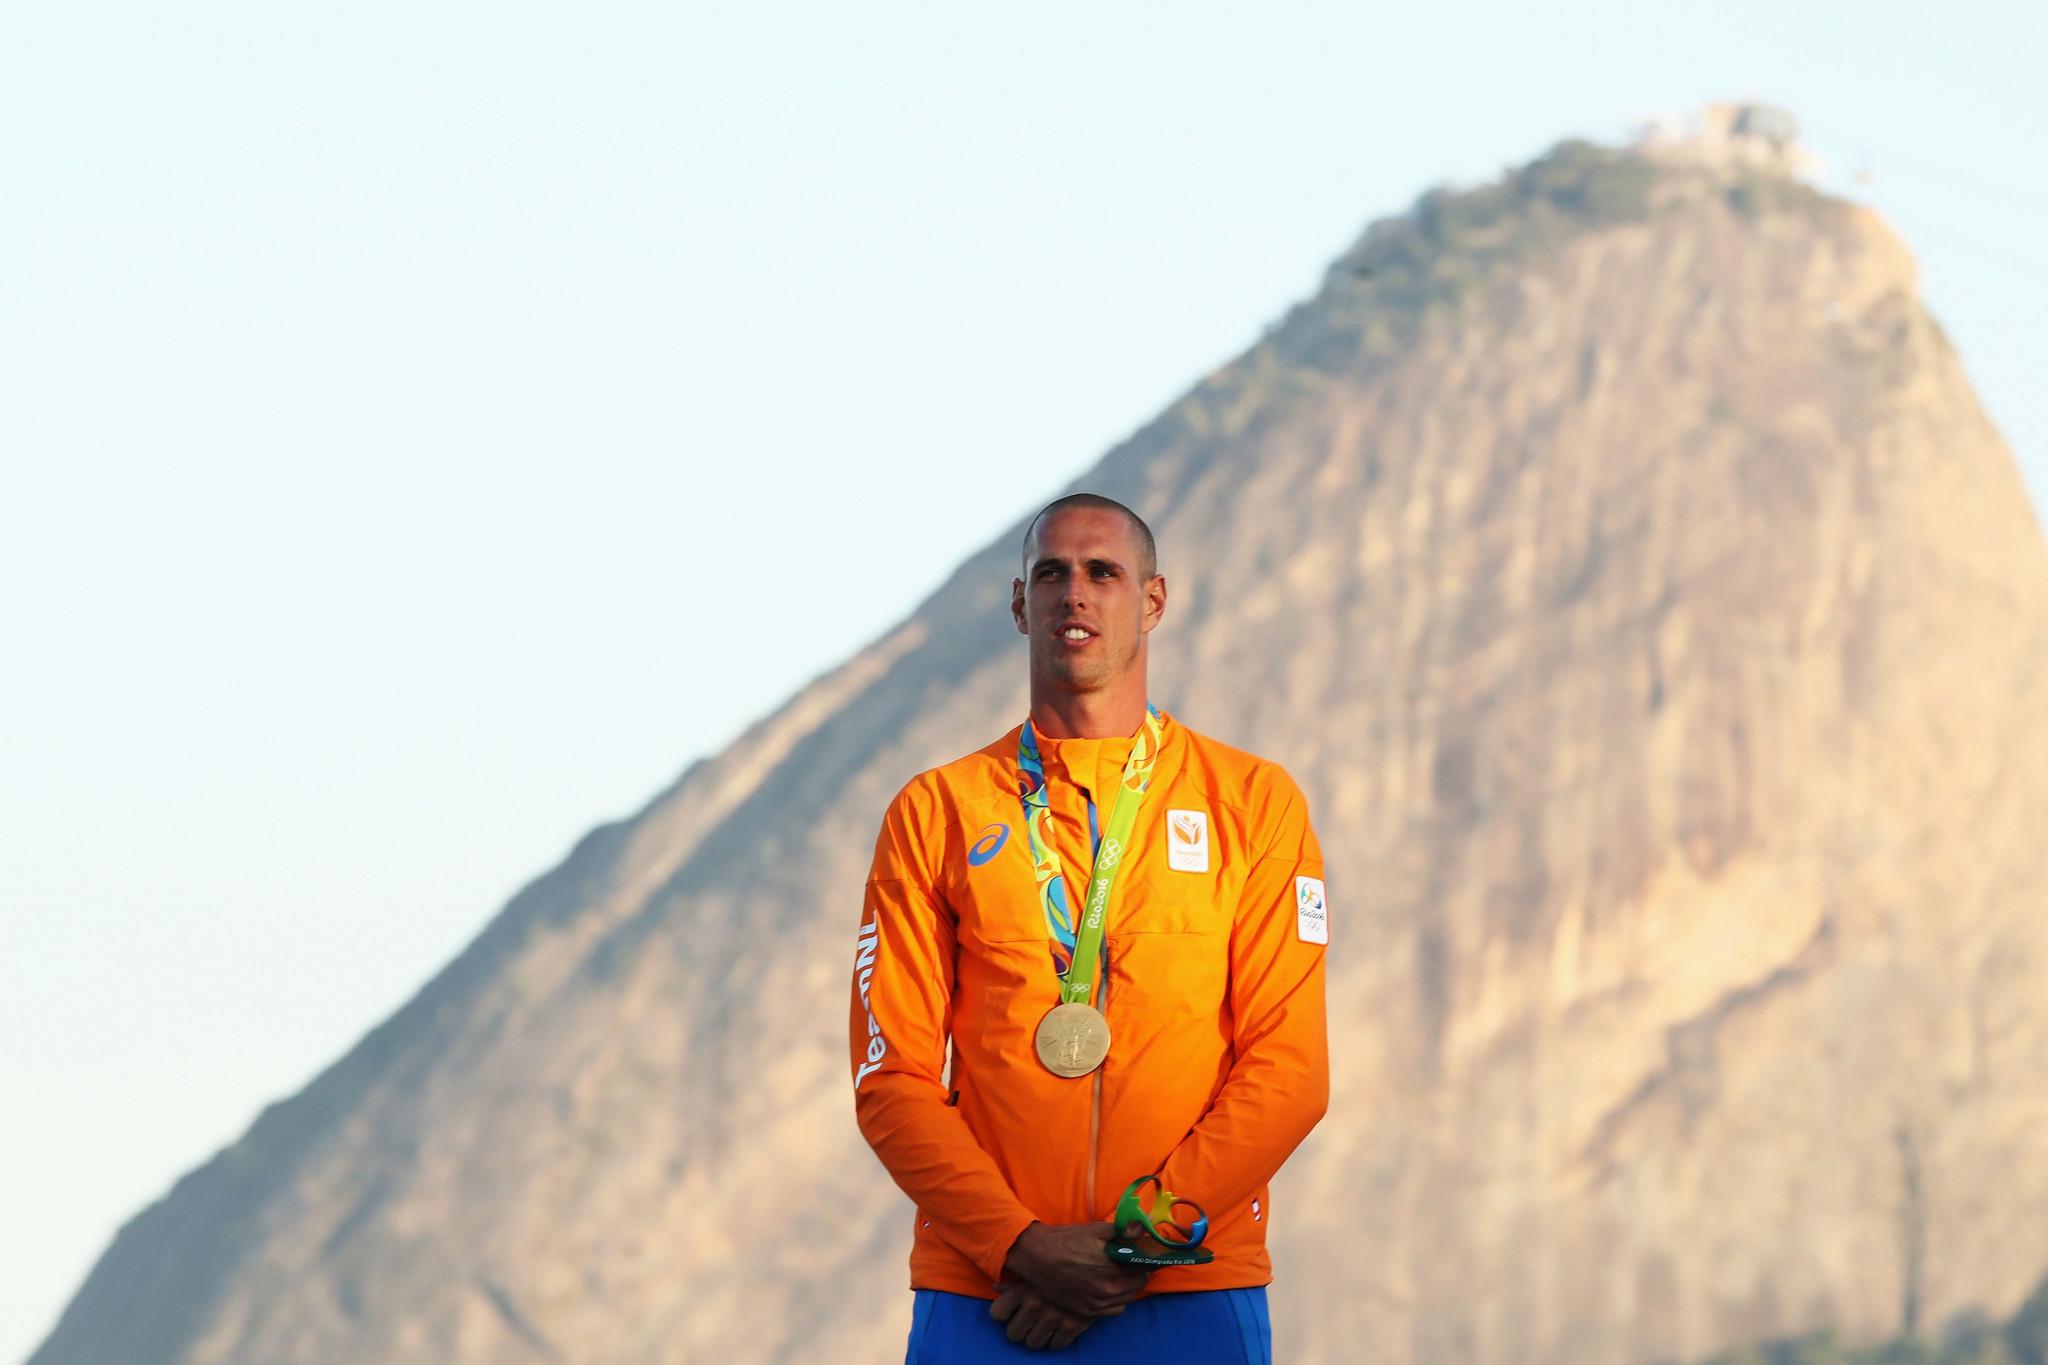 Double Olympic windsurfing champion van Rijsselberge seeks to reclaim world title in Japan